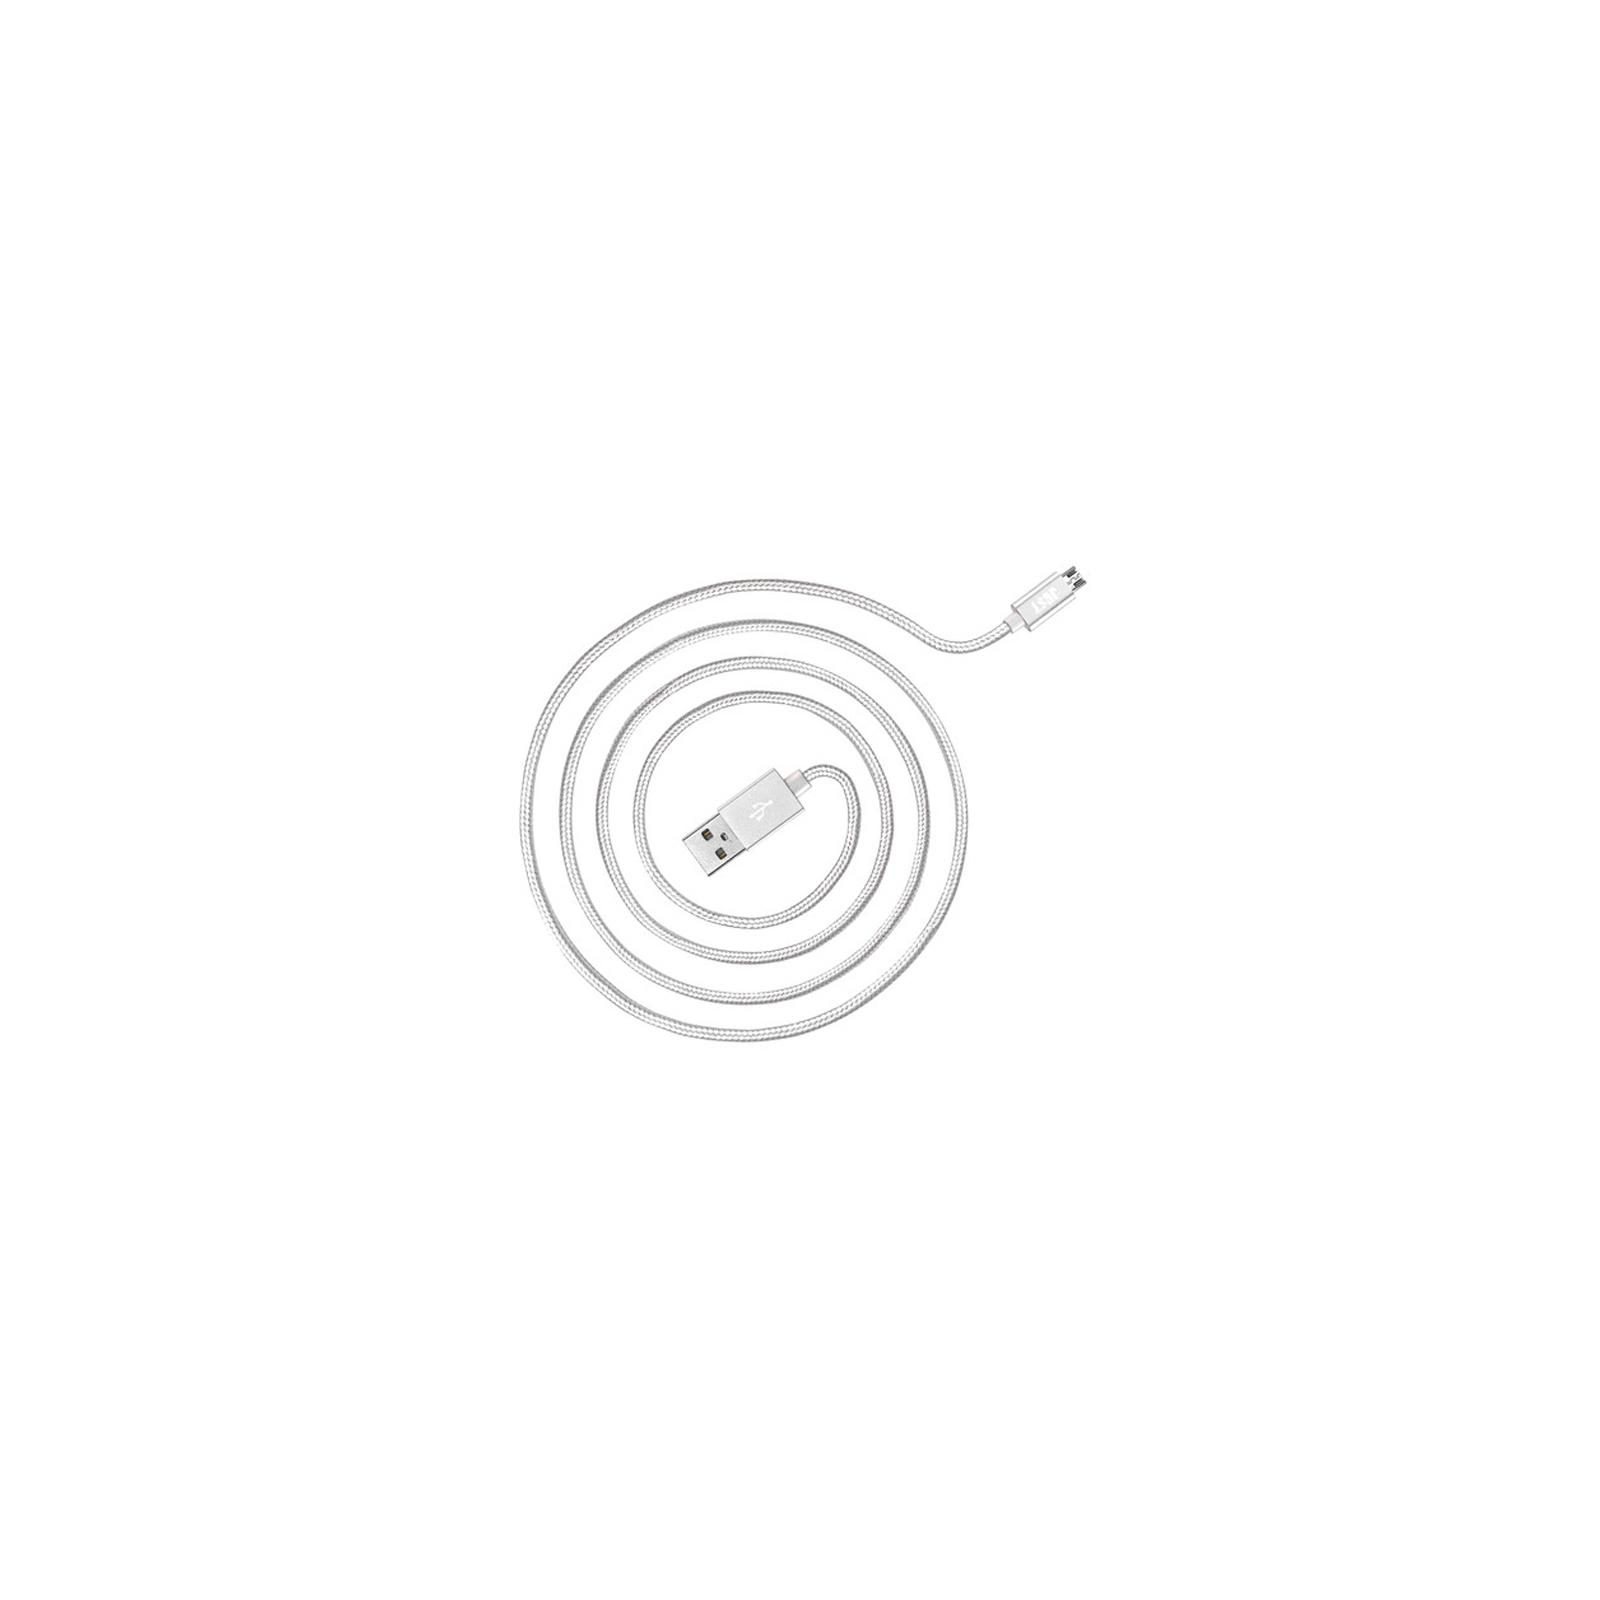 Дата кабель JUST Copper Micro USB Cable 0,5M Silver (MCR-CPR05-SLVR) изображение 2